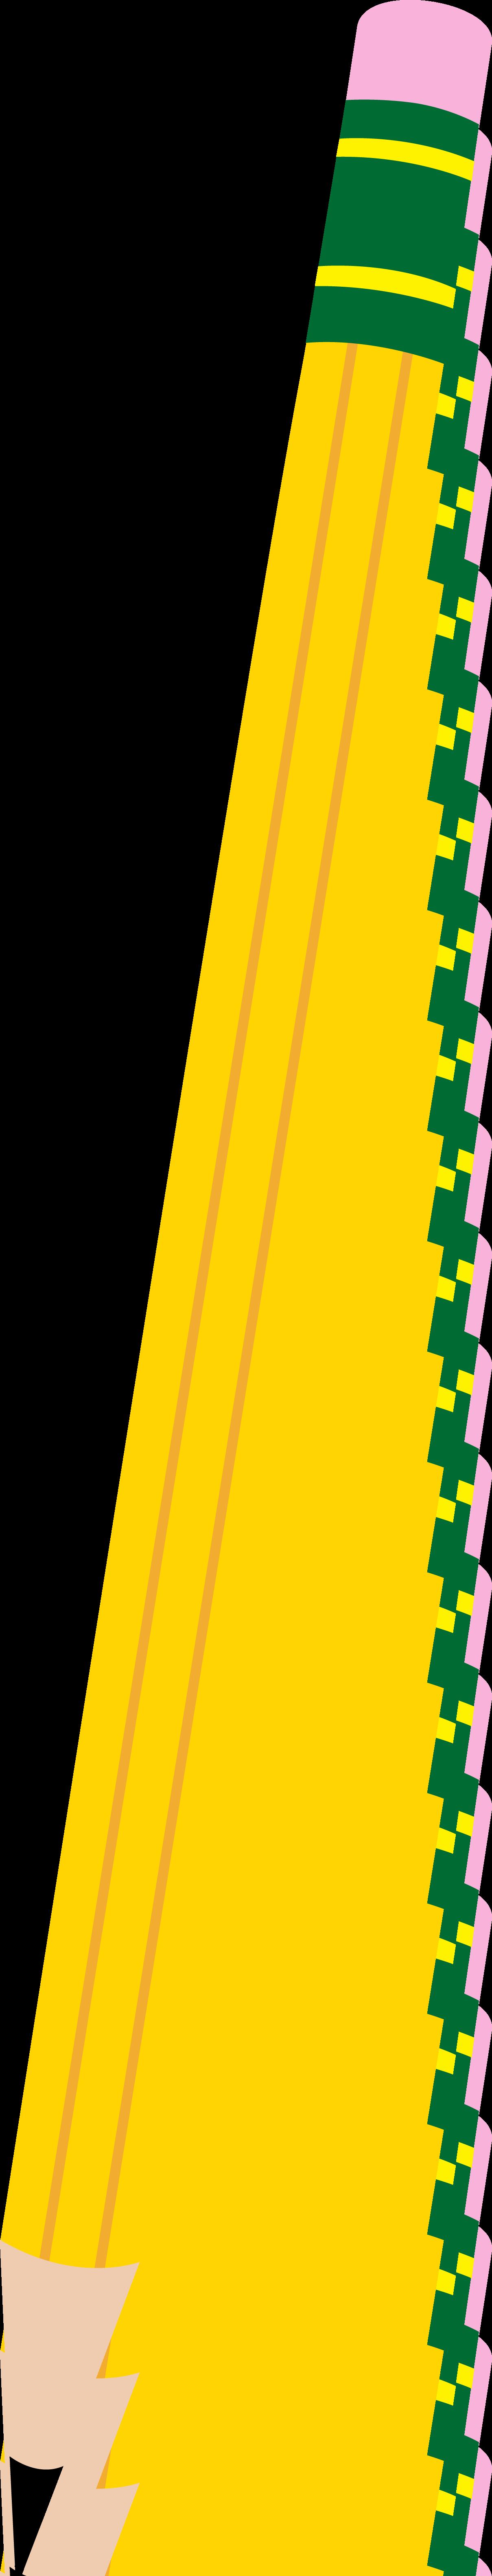 School Clip Art Free Pencil-School Clip Art Free Pencil-18